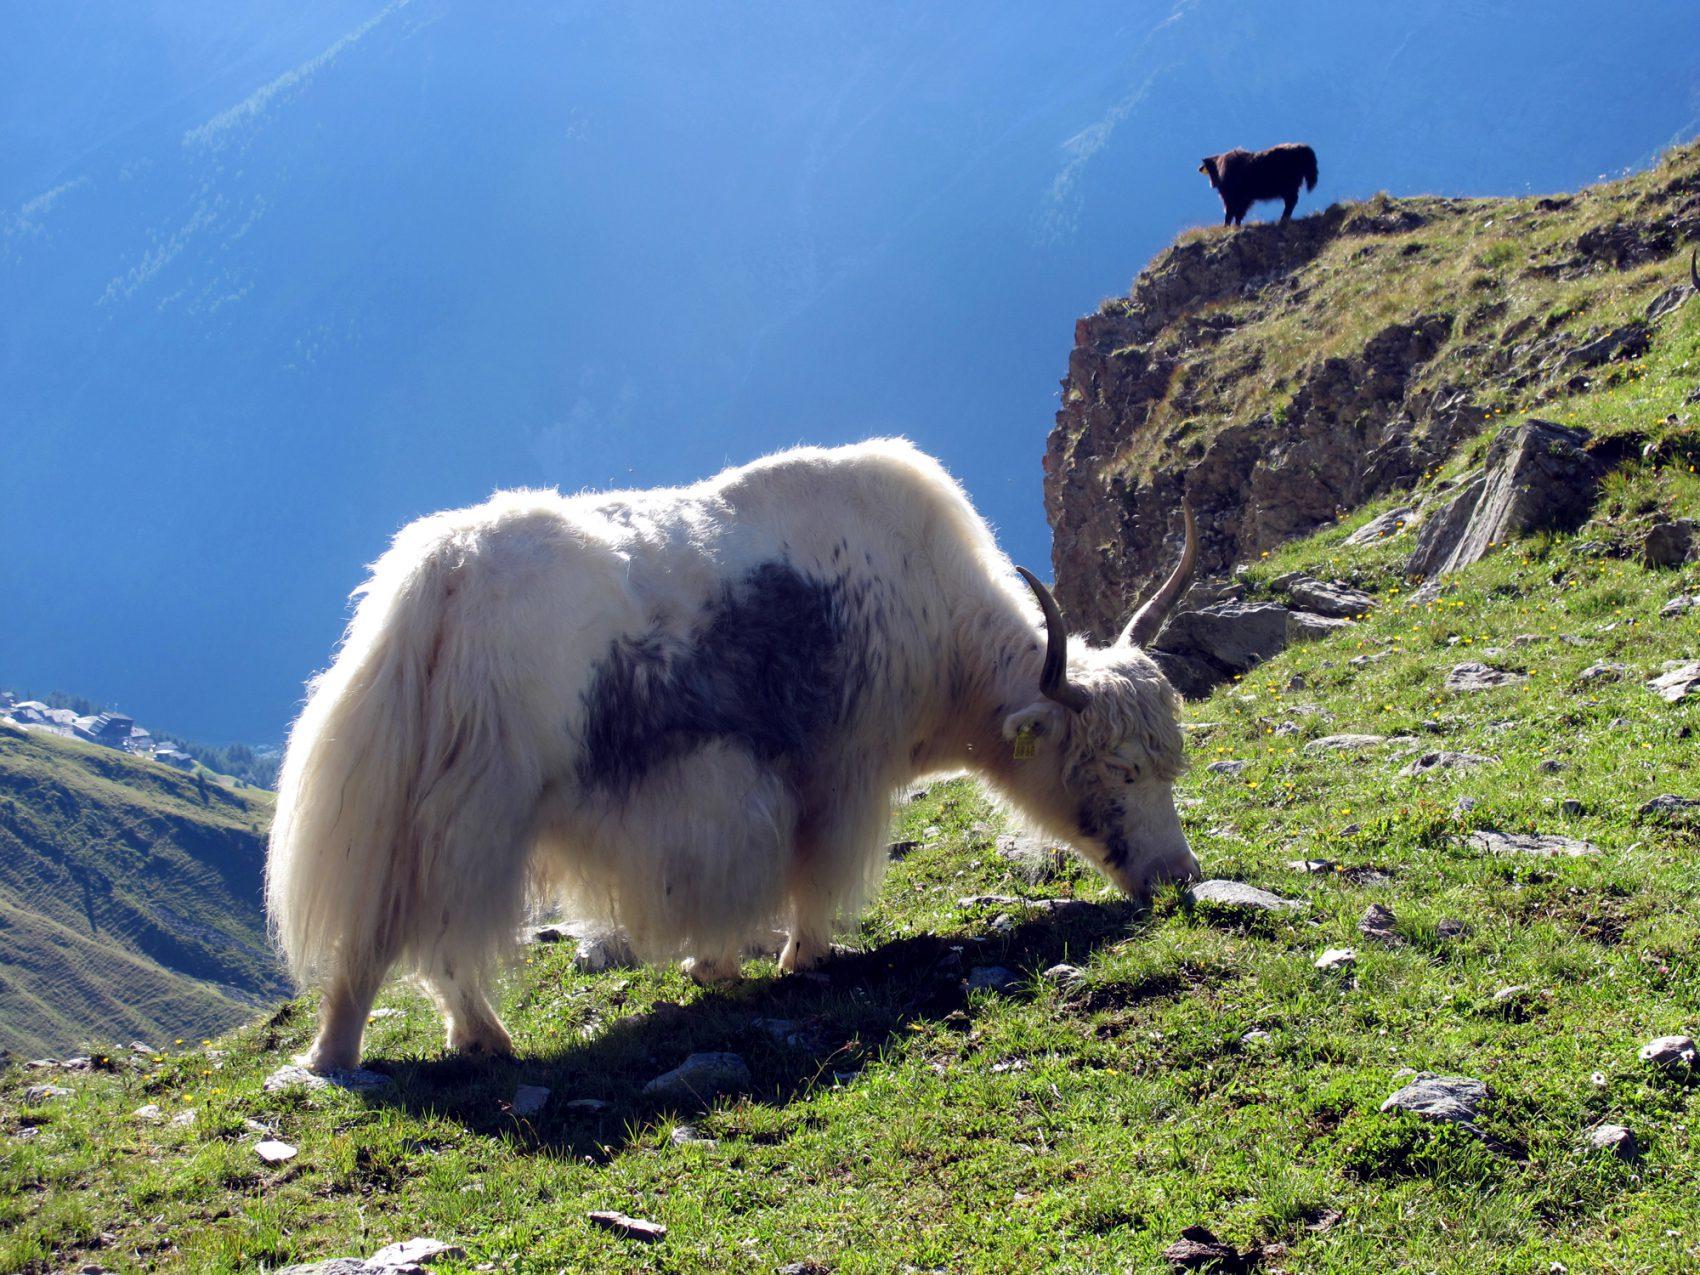 Kuschelige Kühe